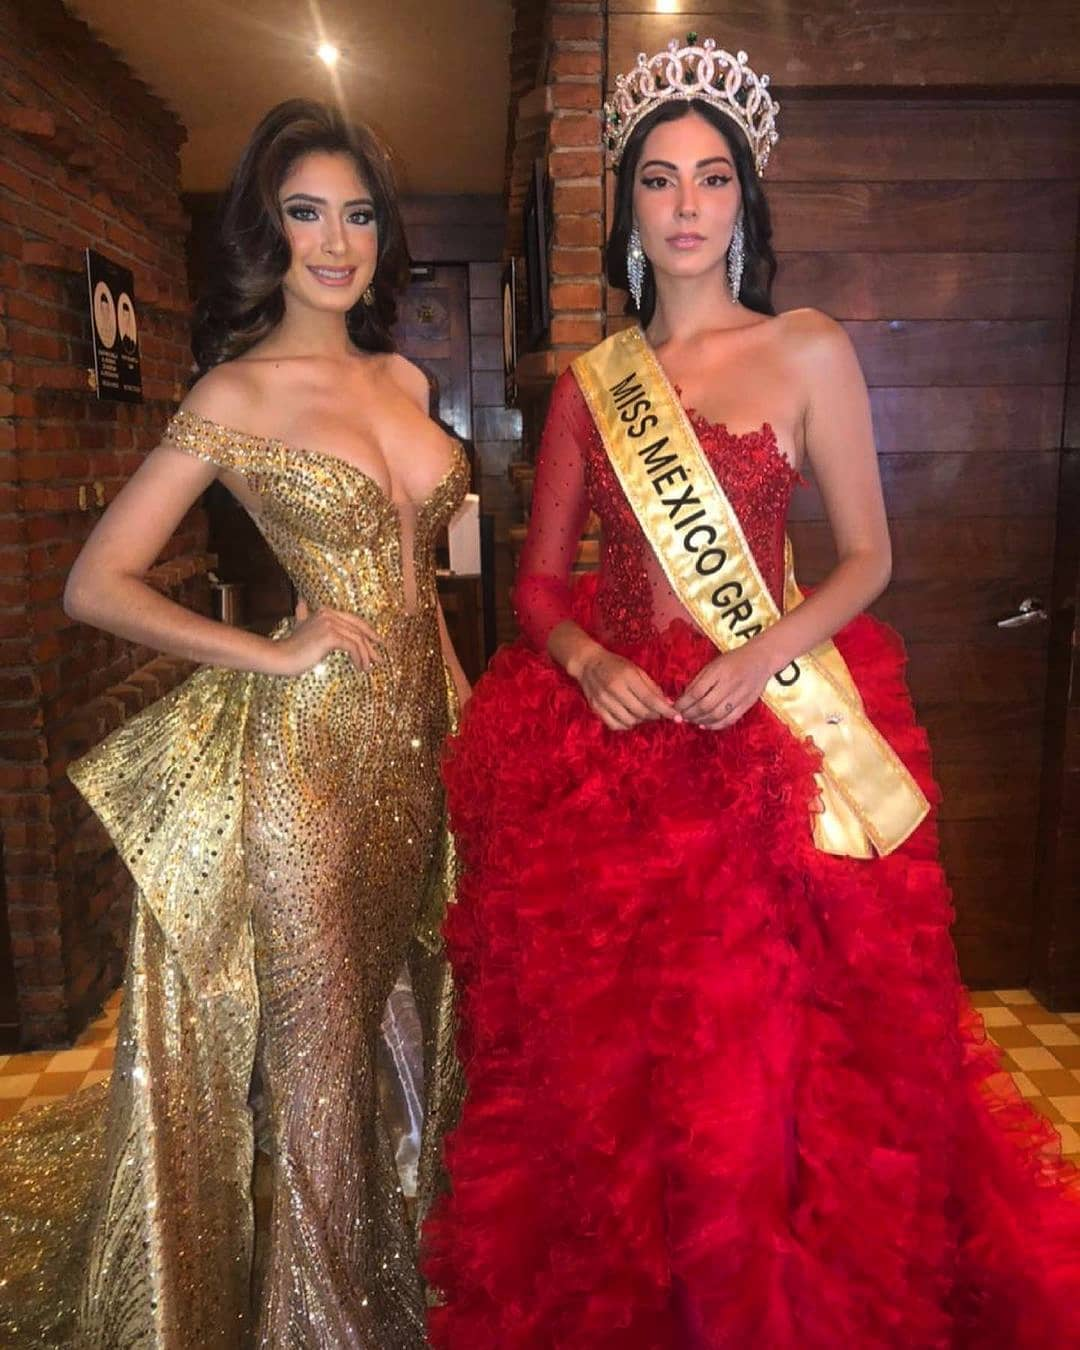 angela leon yuriar, top 21 de miss grand international 2020. - Página 11 Yoqgl10